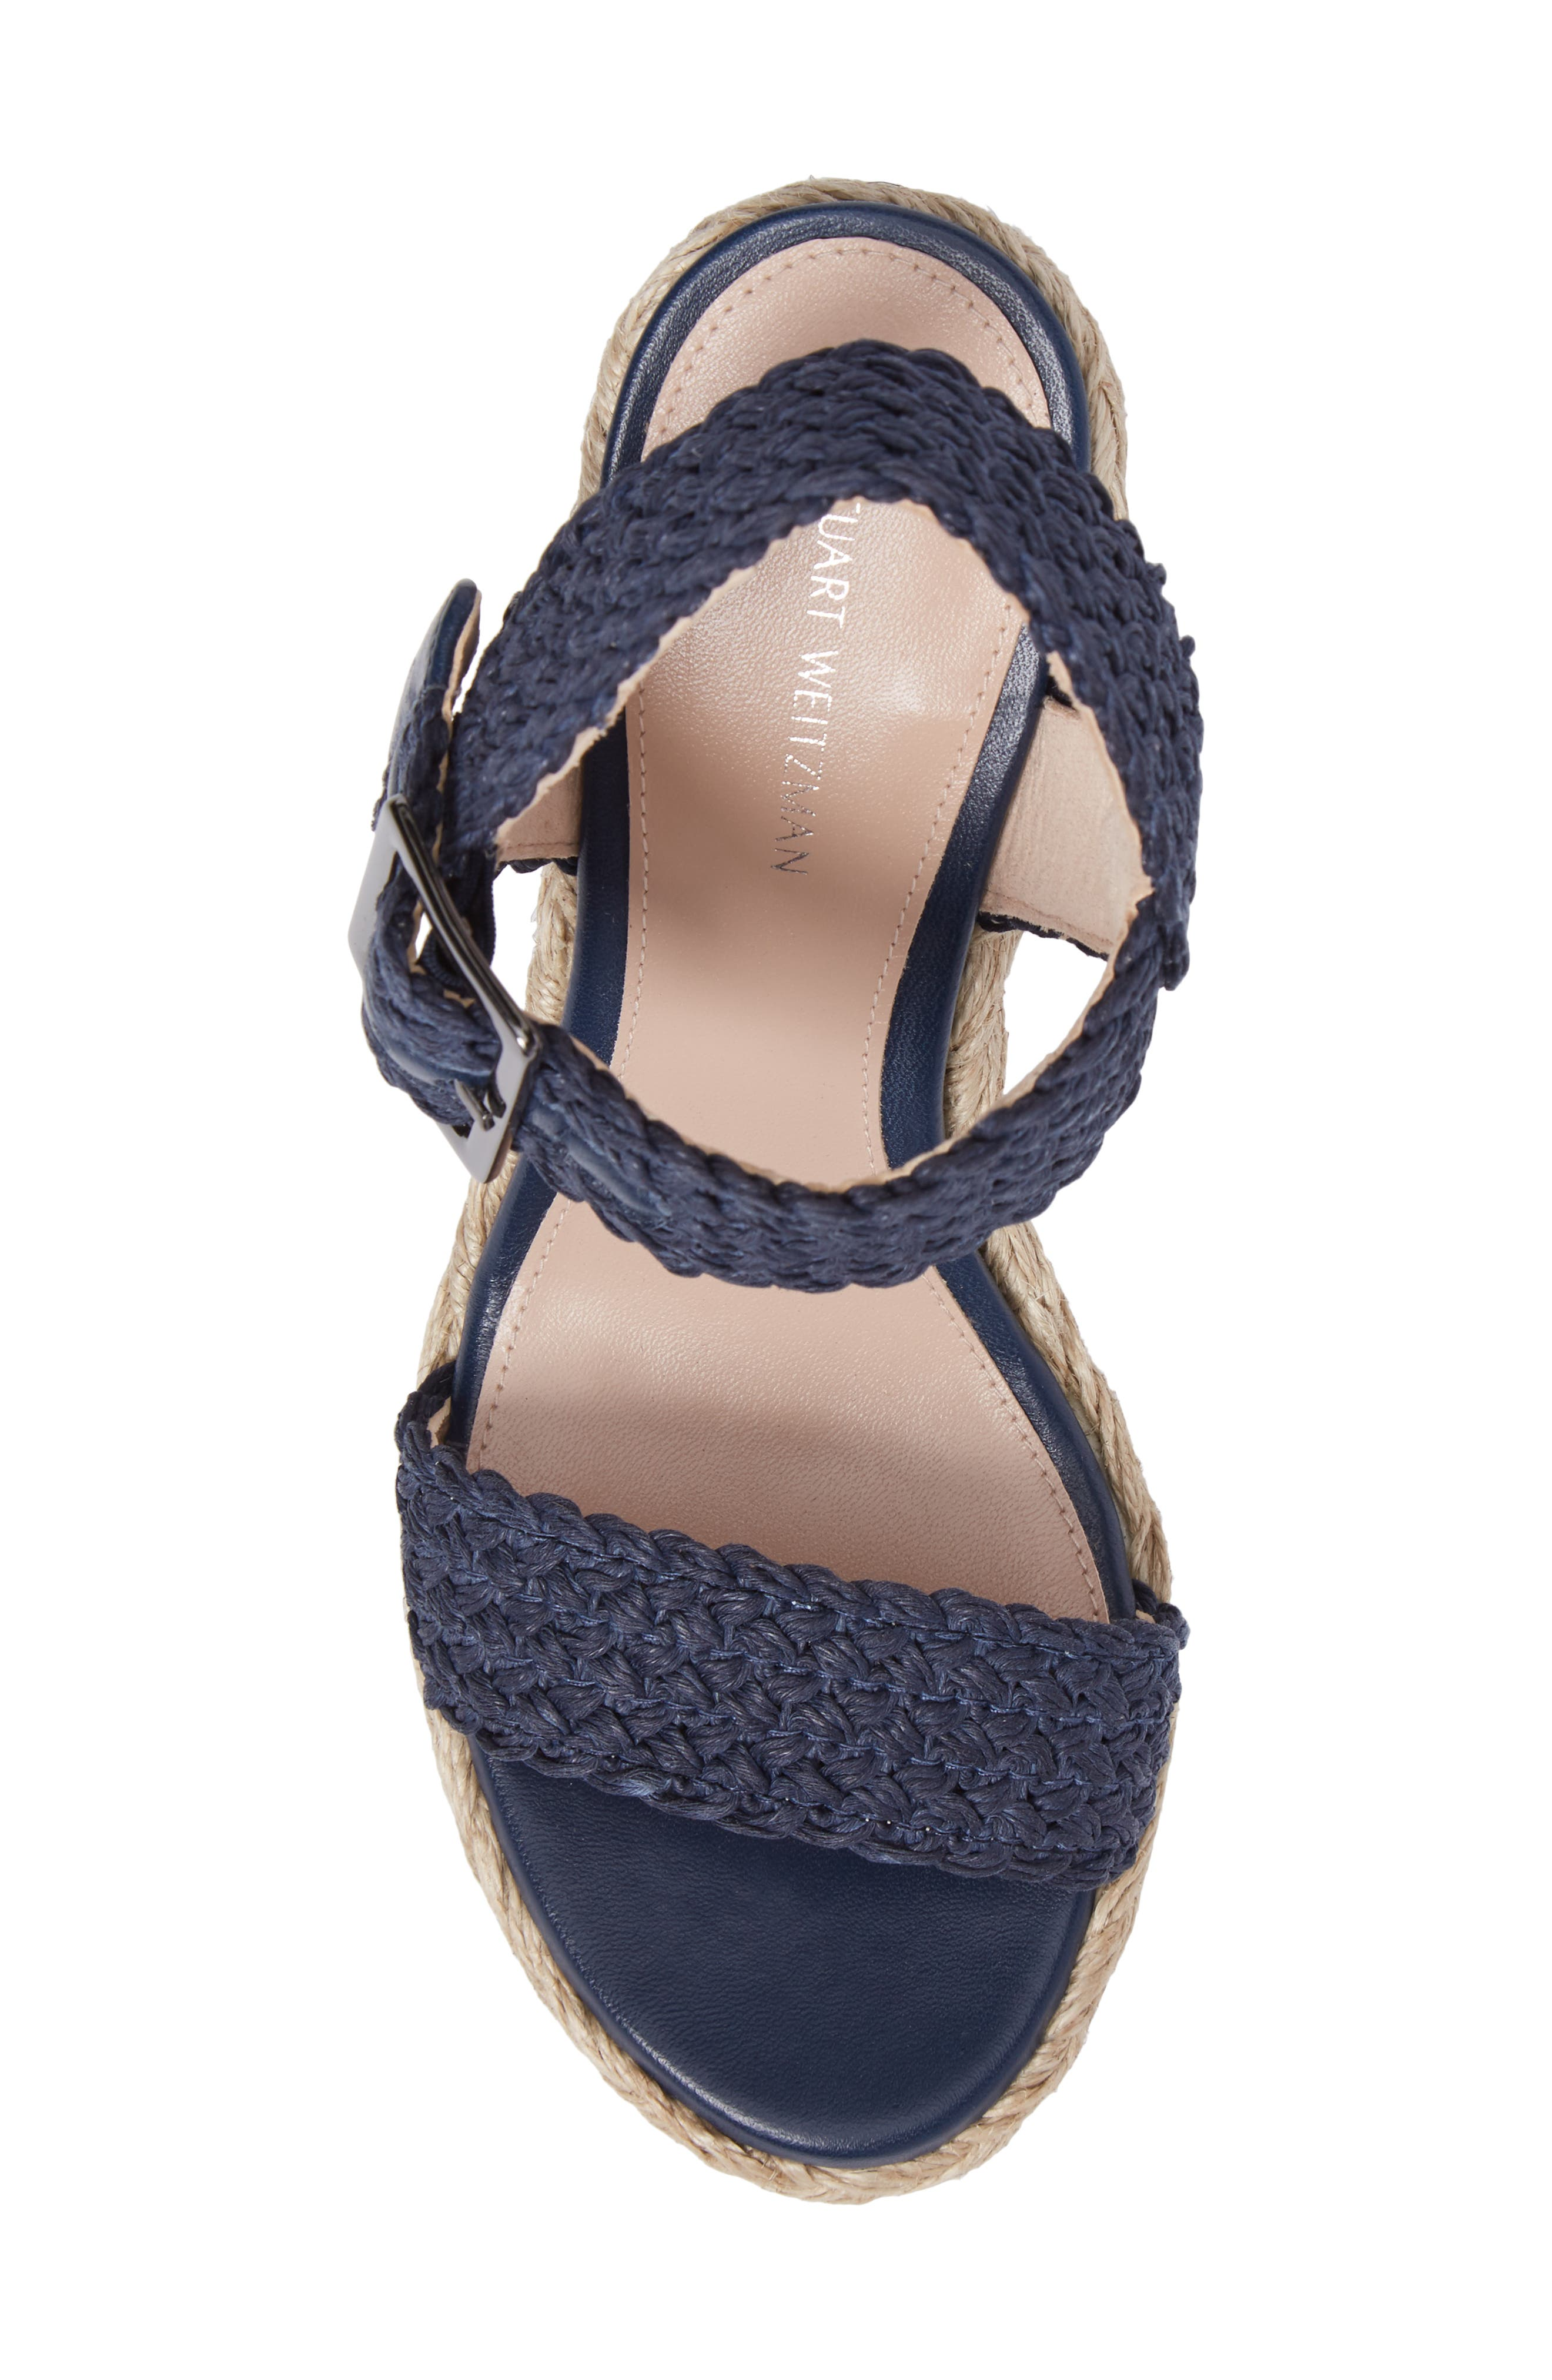 Alexis Espadrille Platform Wedge,                             Alternate thumbnail 5, color,                             Nice Blue Crochet